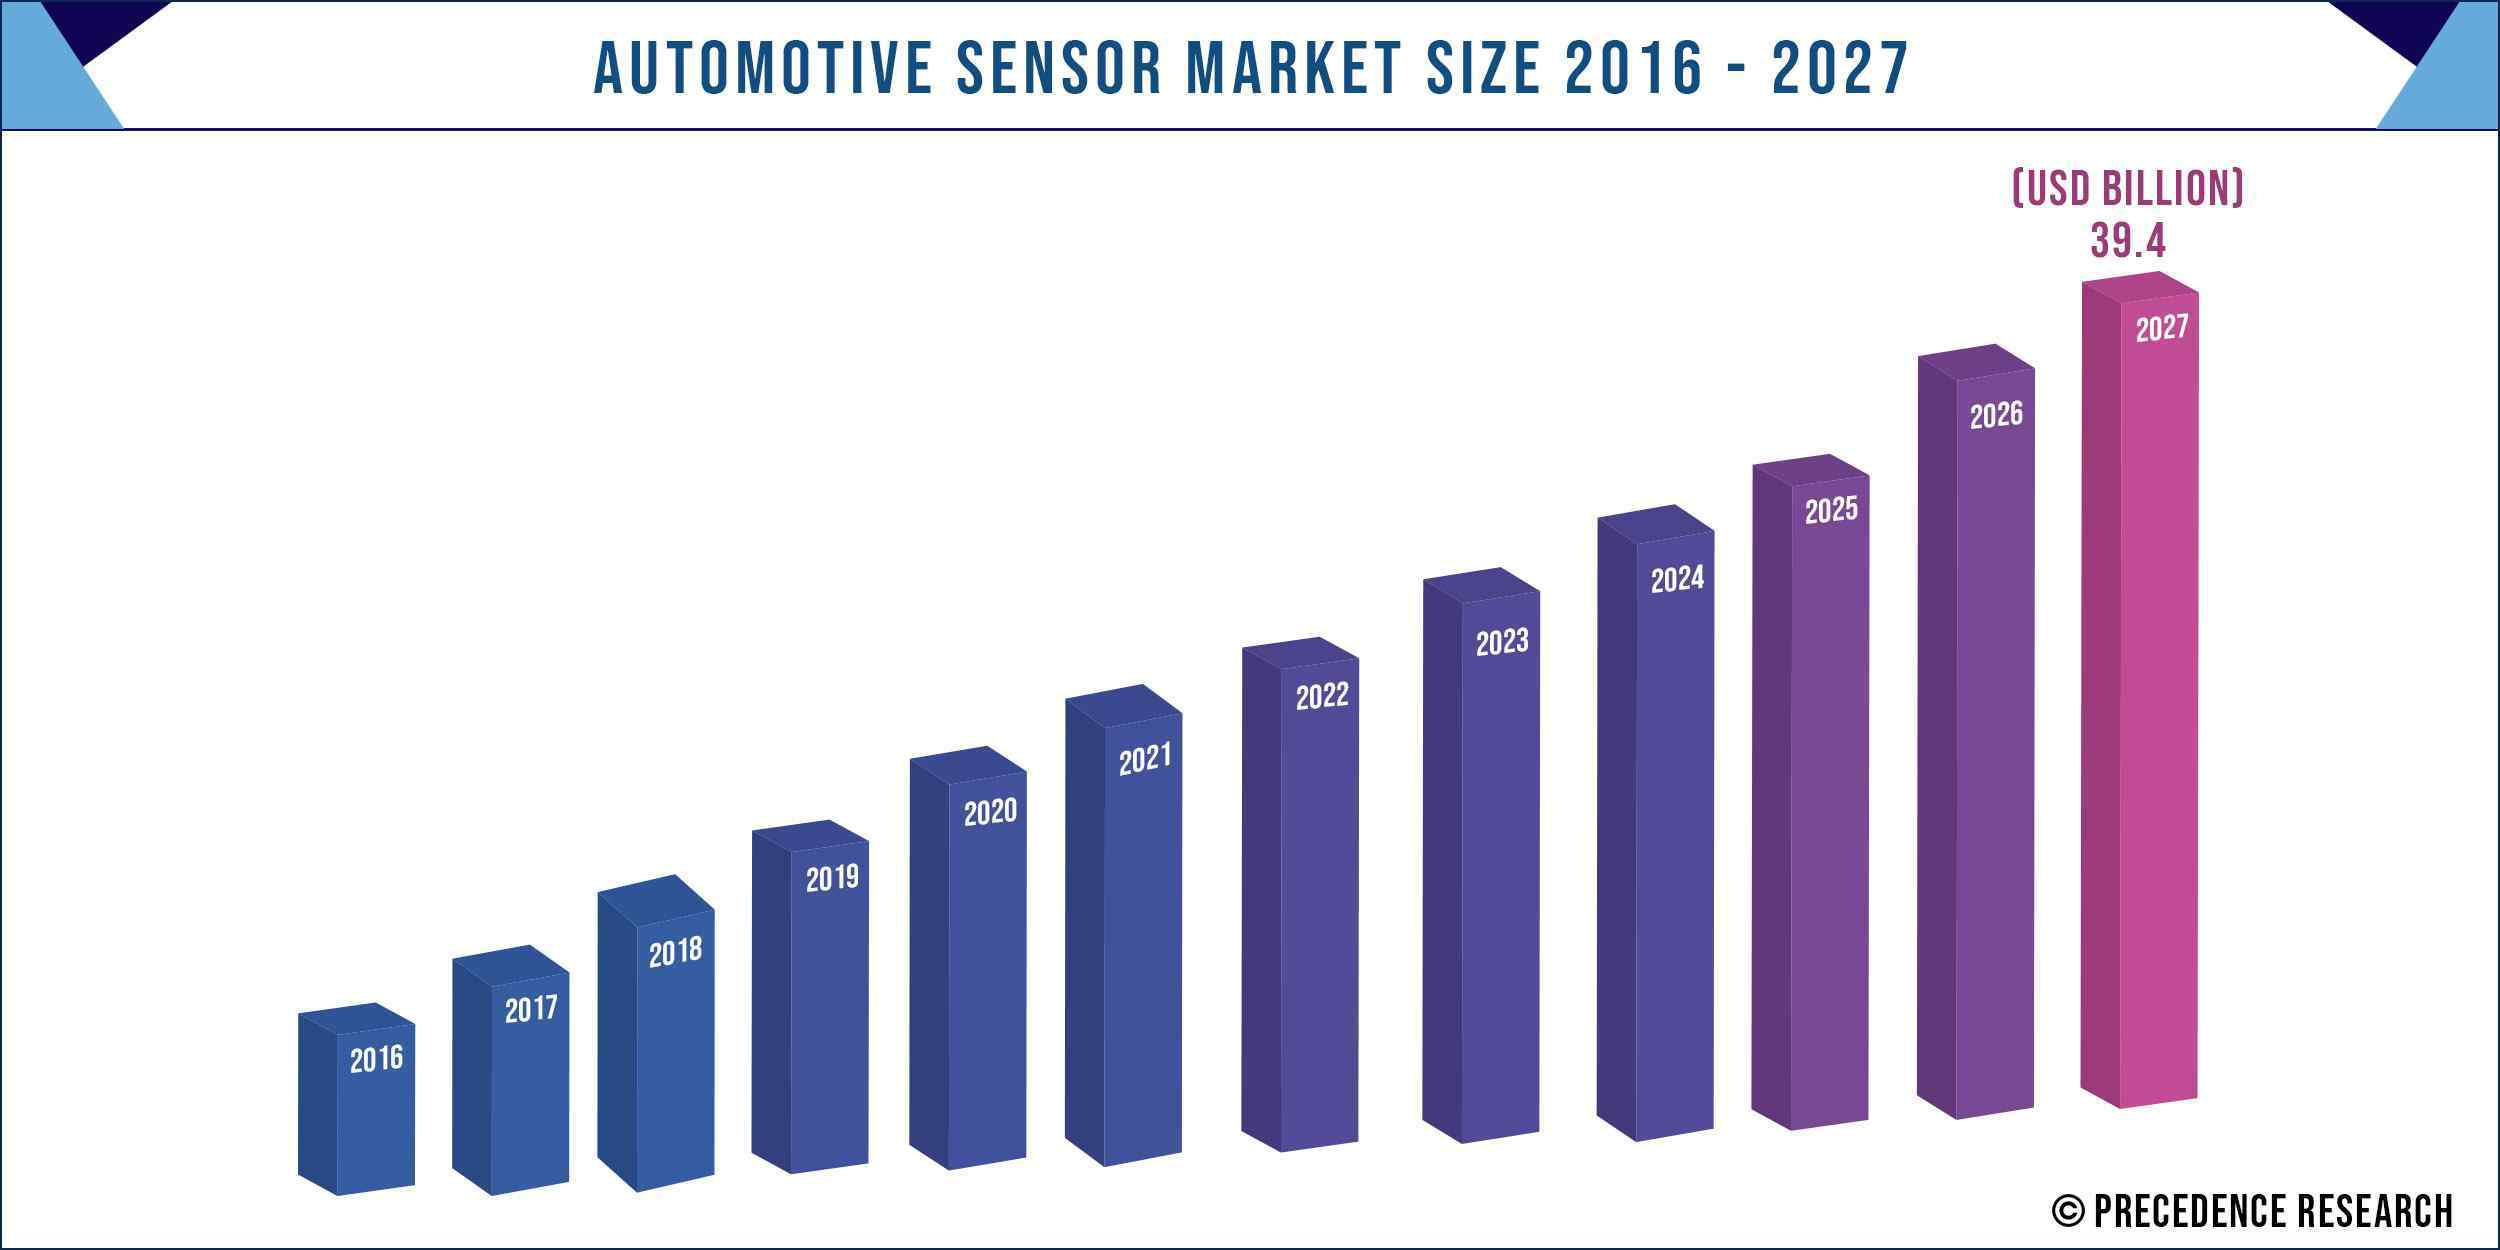 Automotive Sensor Market Size 2016-2027